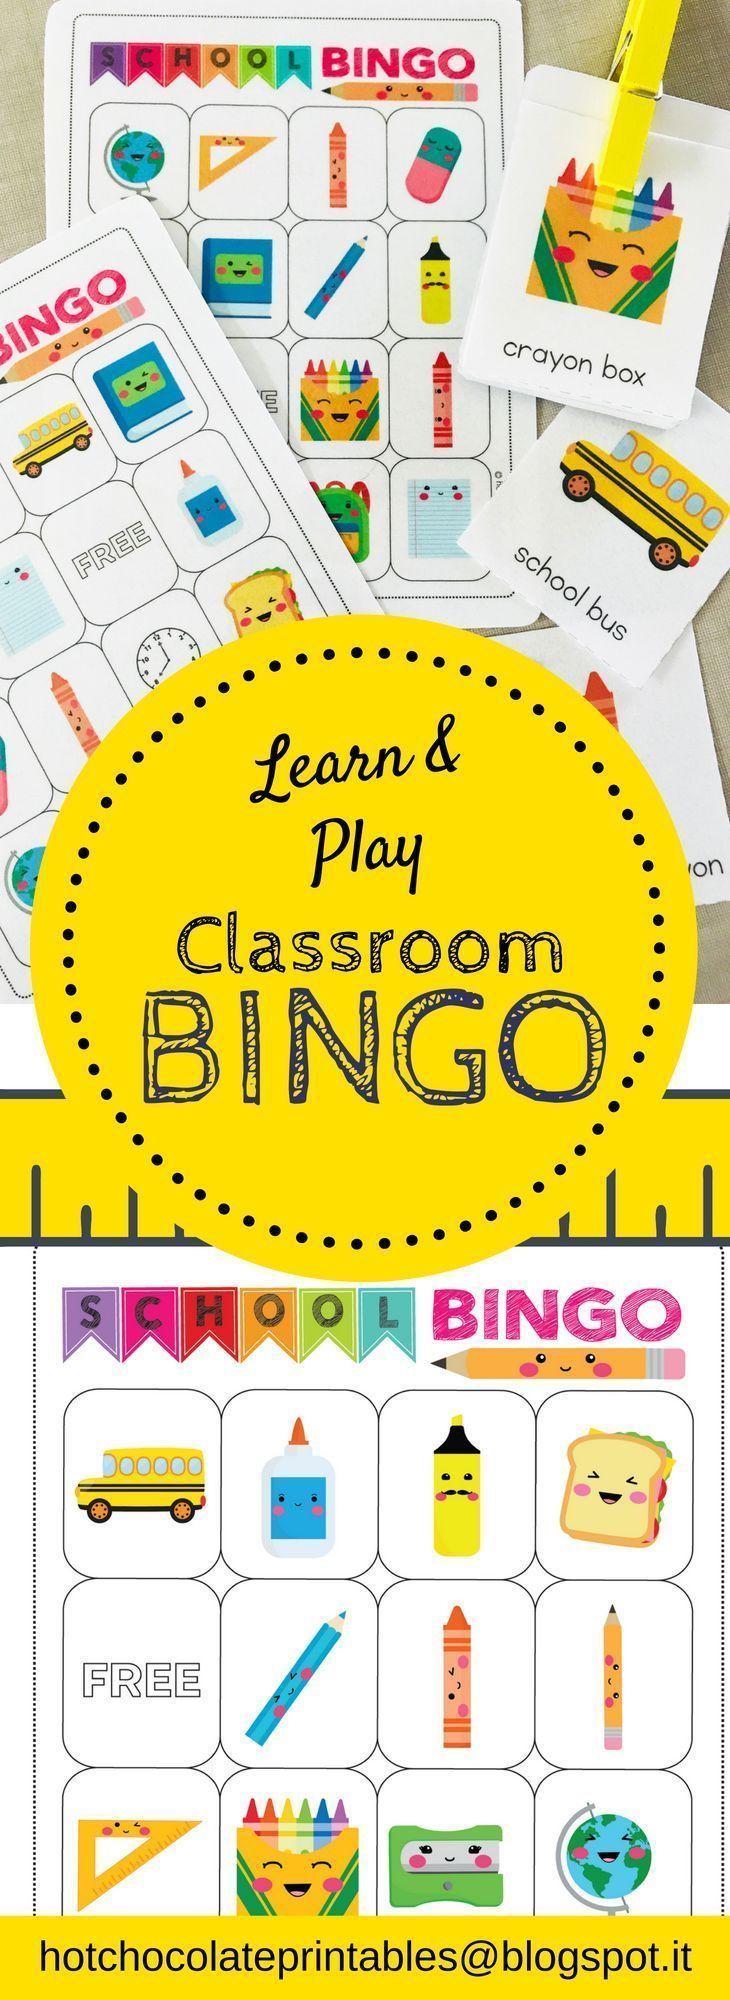 School Supplies Bingo Board And Flashcard Set Flashcards Games For Kids Classroom School Classroom [ 2000 x 730 Pixel ]